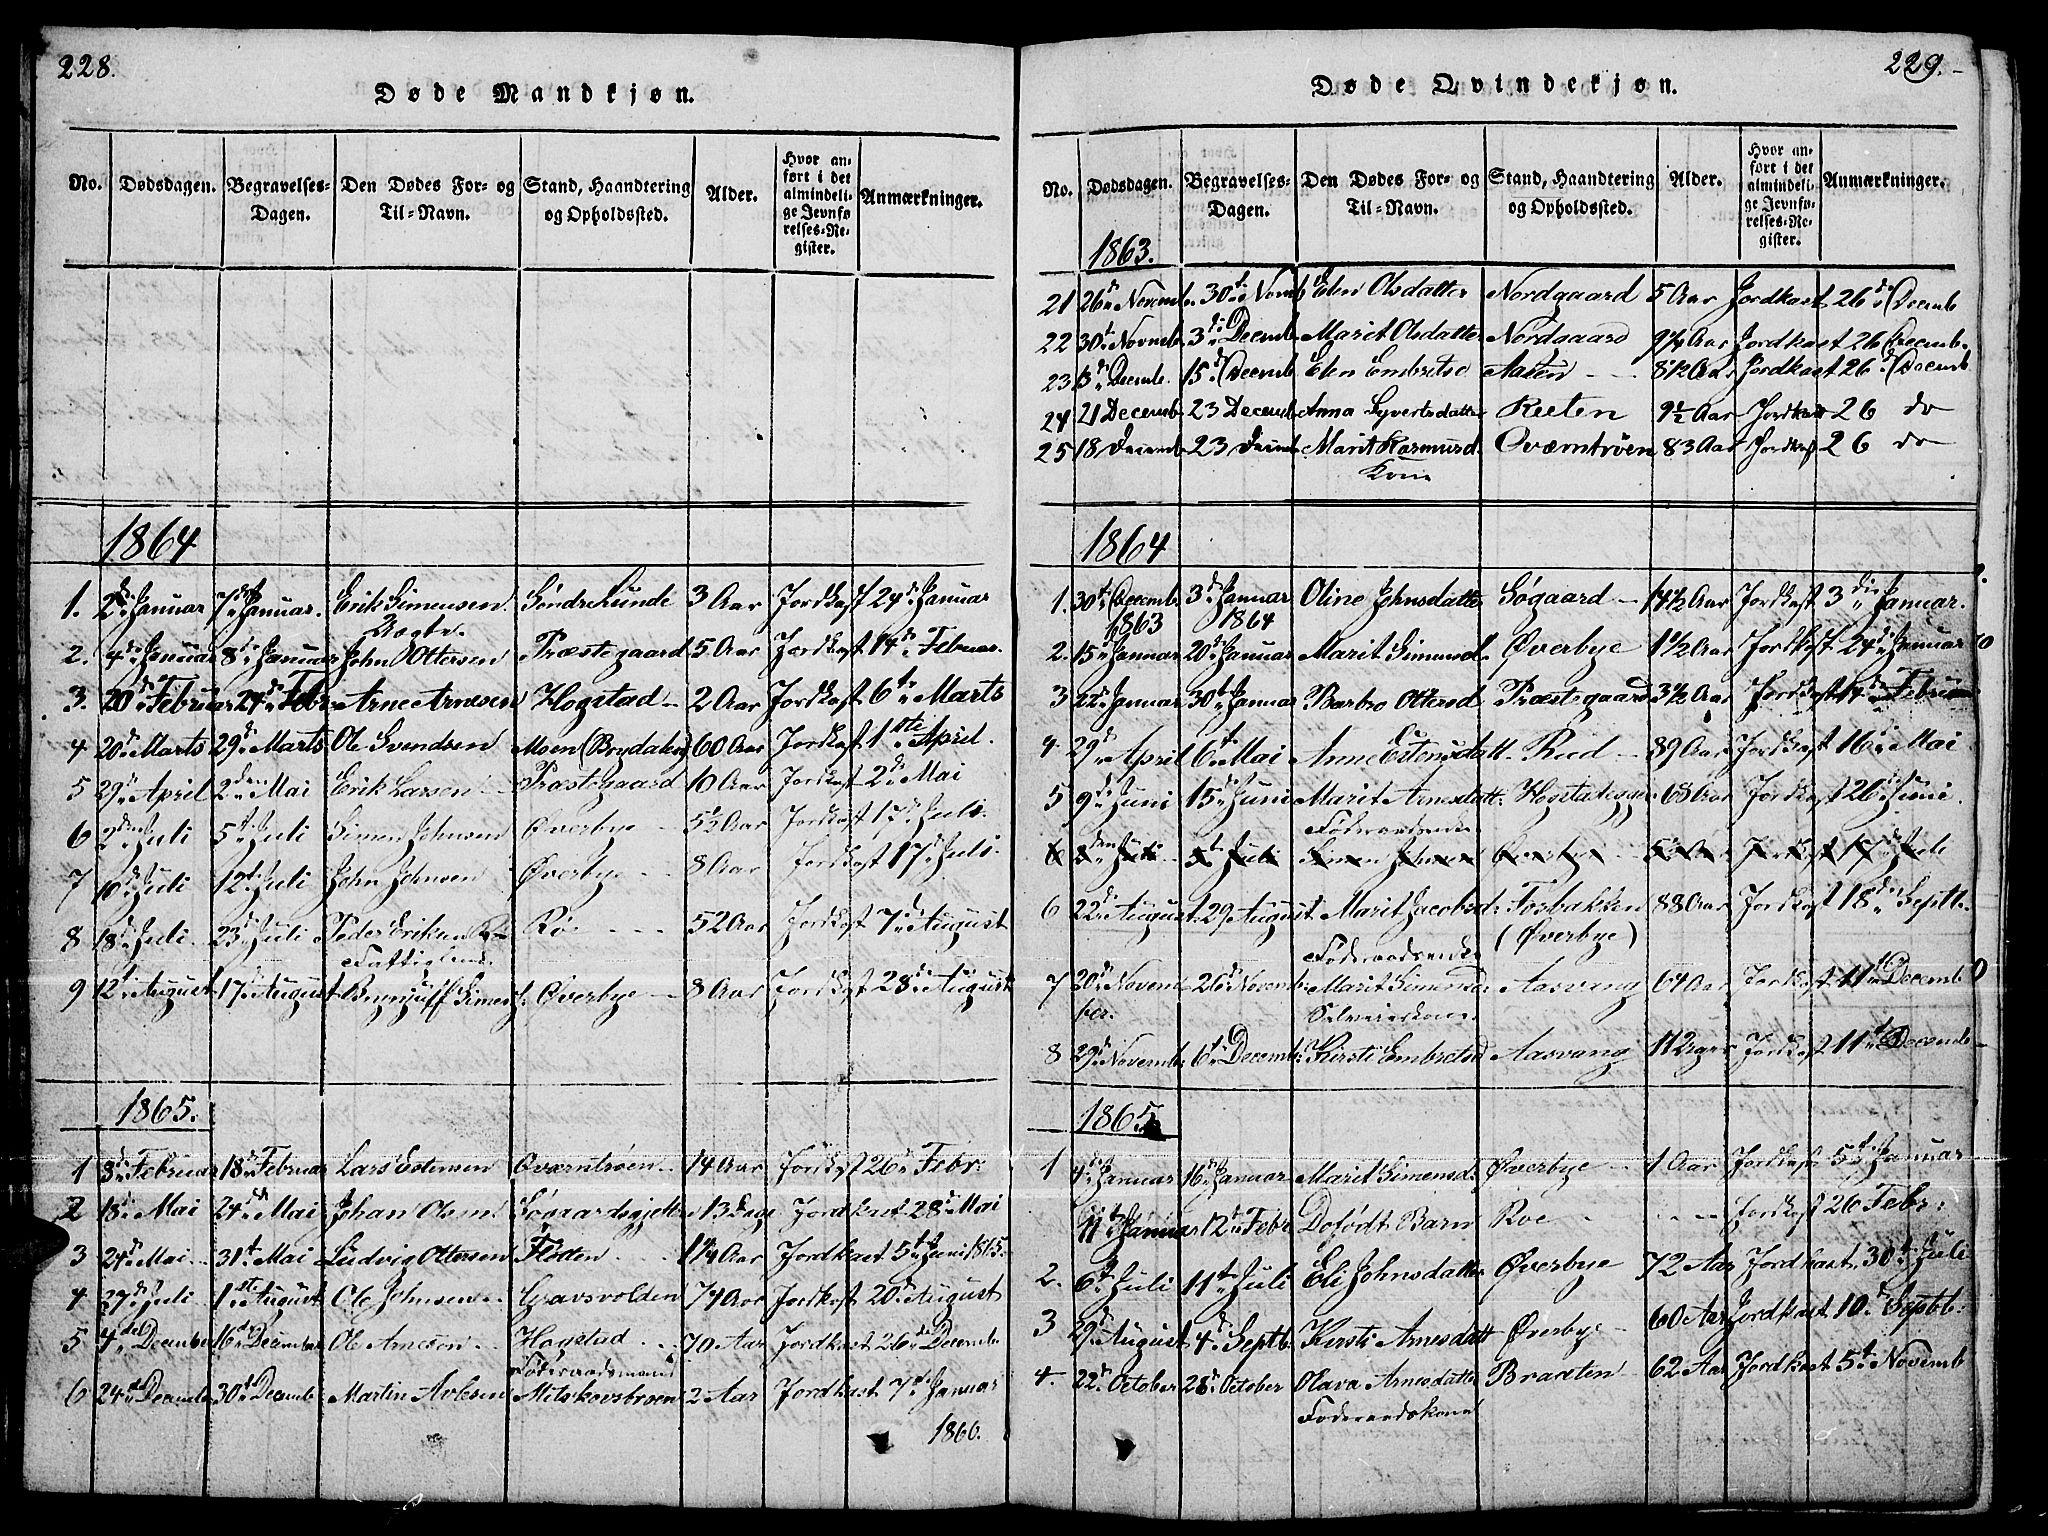 SAH, Tynset prestekontor, Klokkerbok nr. 4, 1814-1879, s. 228-229